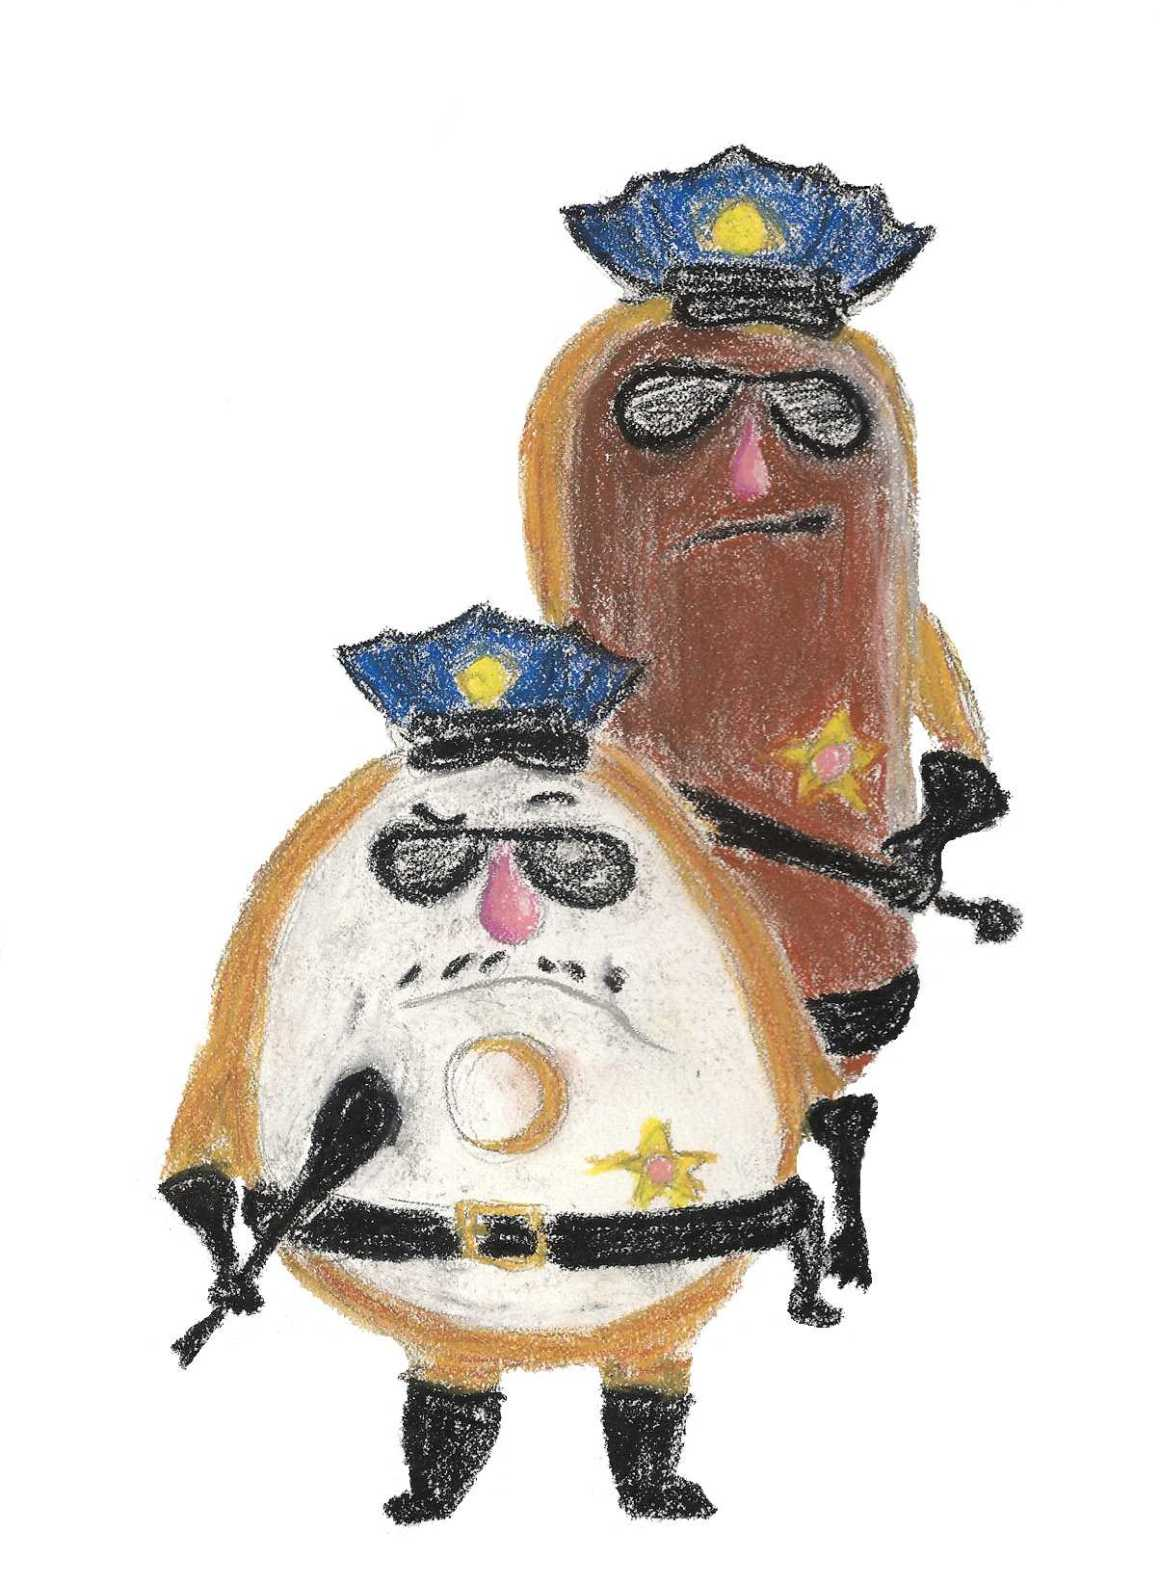 Donut Cops: an illustration